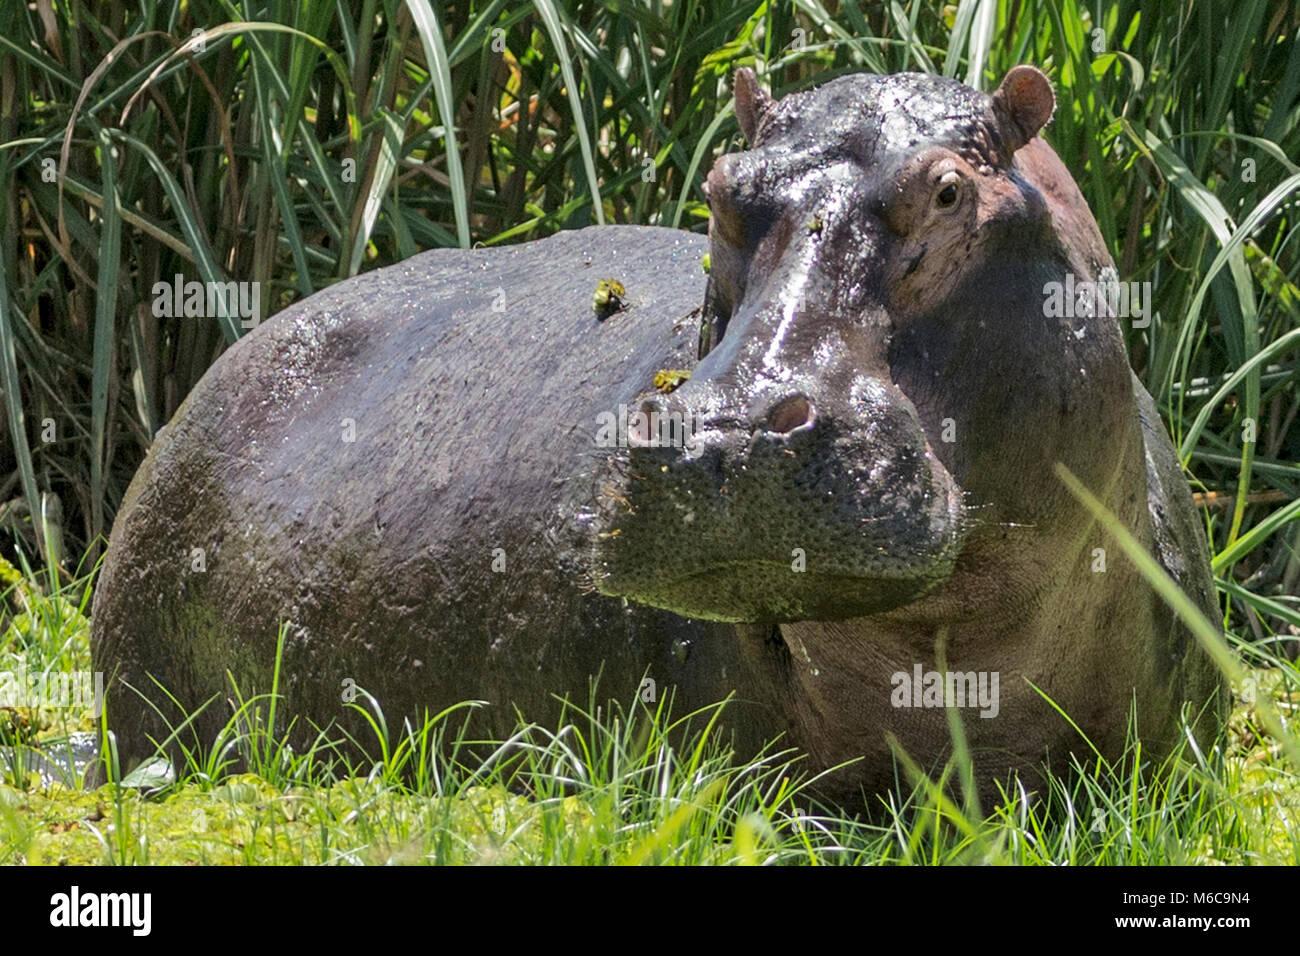 Hipopótamo (Hippopotamus amphibius), 'Murchison's Falls National Park', Uganda, África Imagen De Stock